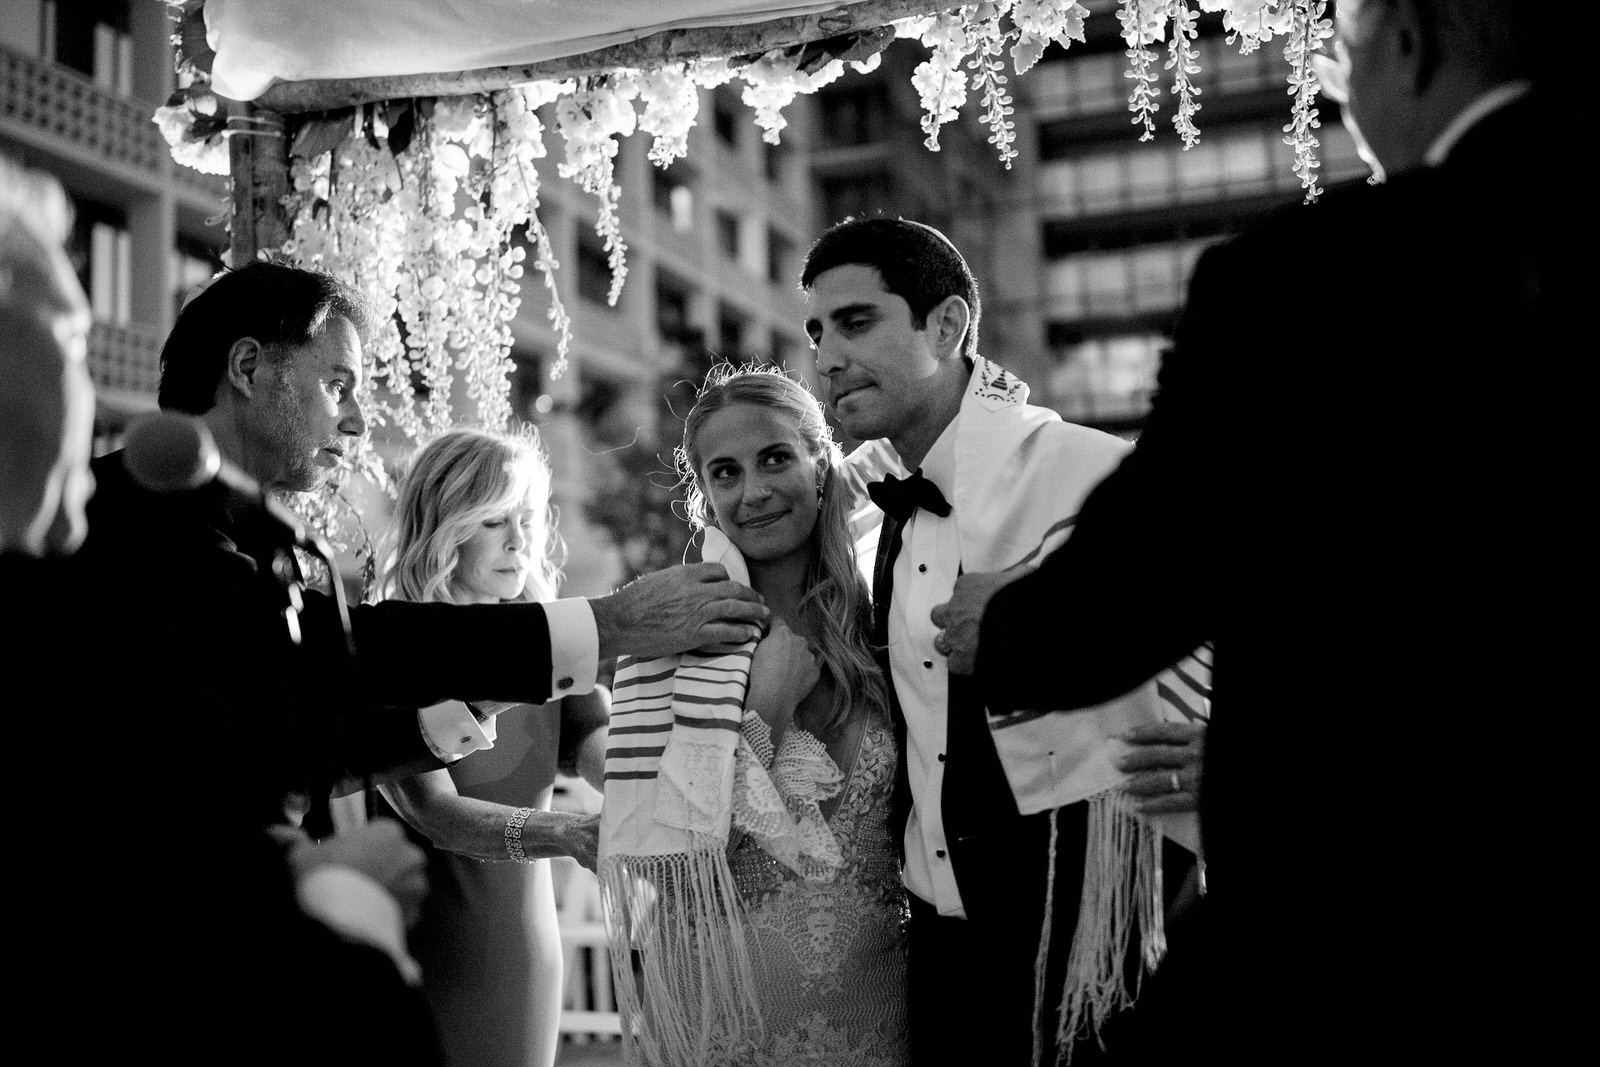 miami_beach_edition_wedding_tiny_house_photo-47.jpg